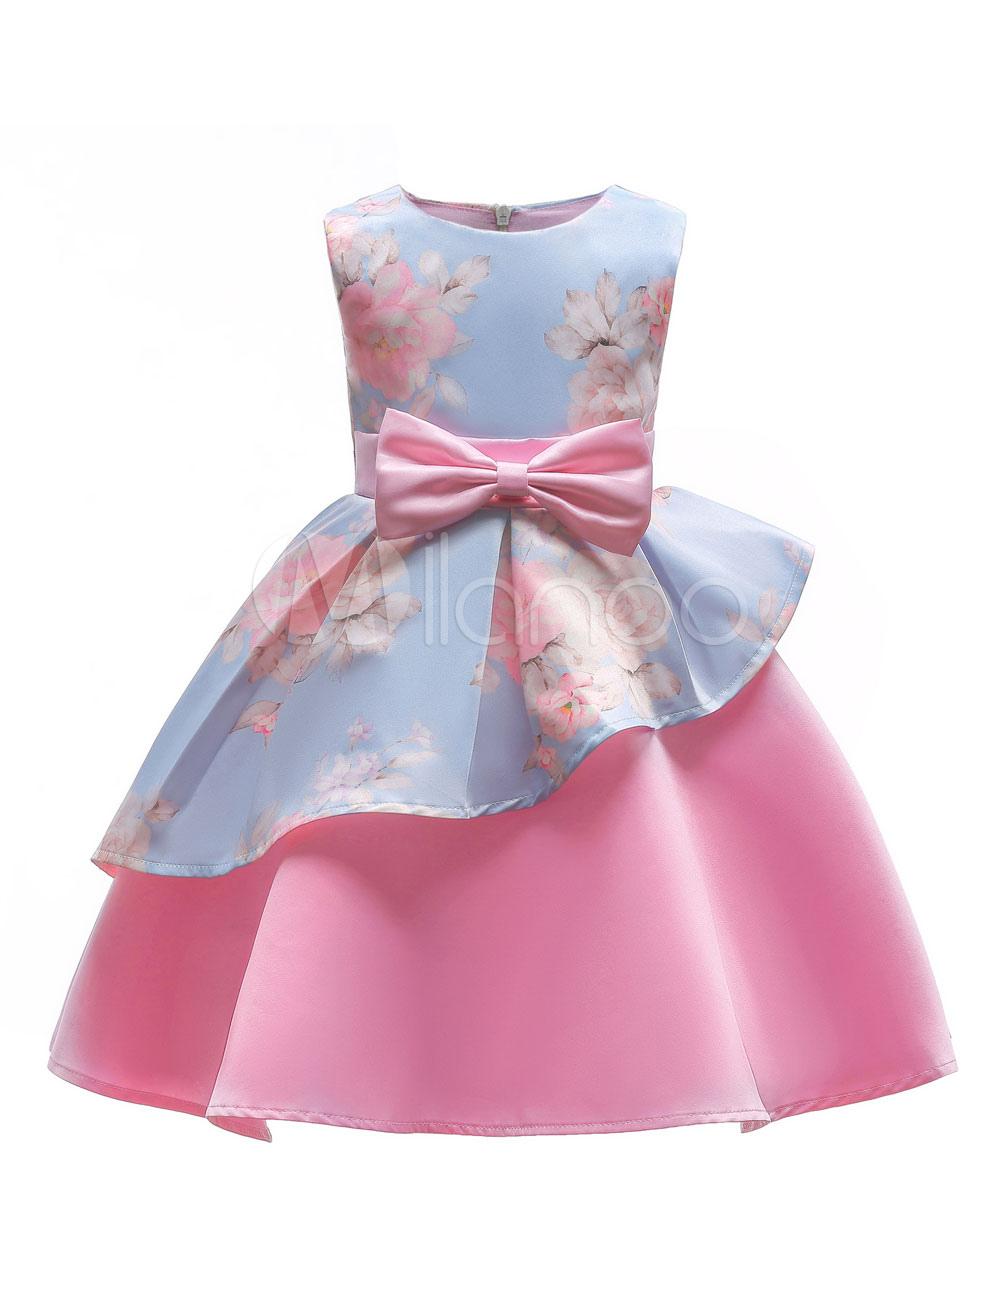 8bcc543a77fd Flower Girl Dresses Floral – DACC